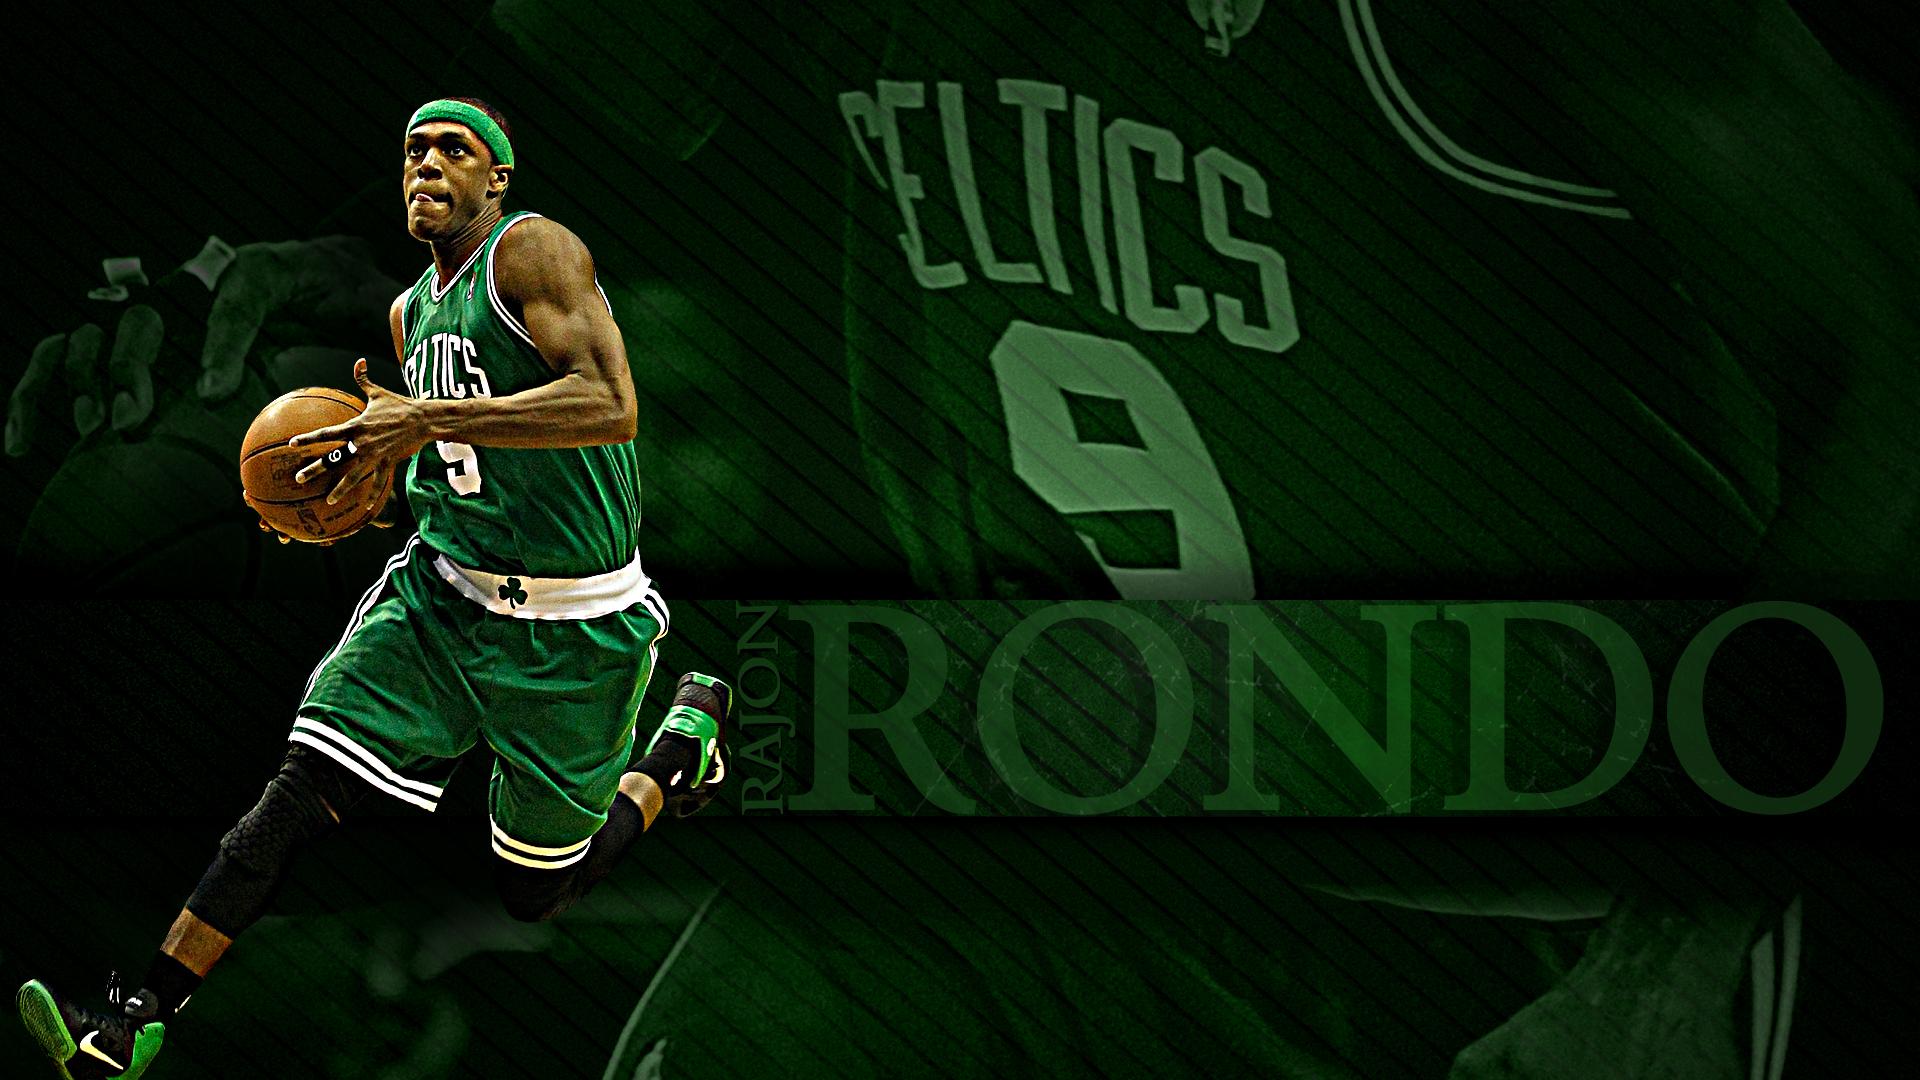 NBA Basketball Boston Celtics Rajon Rondo 1920x1080 HD 1920x1080